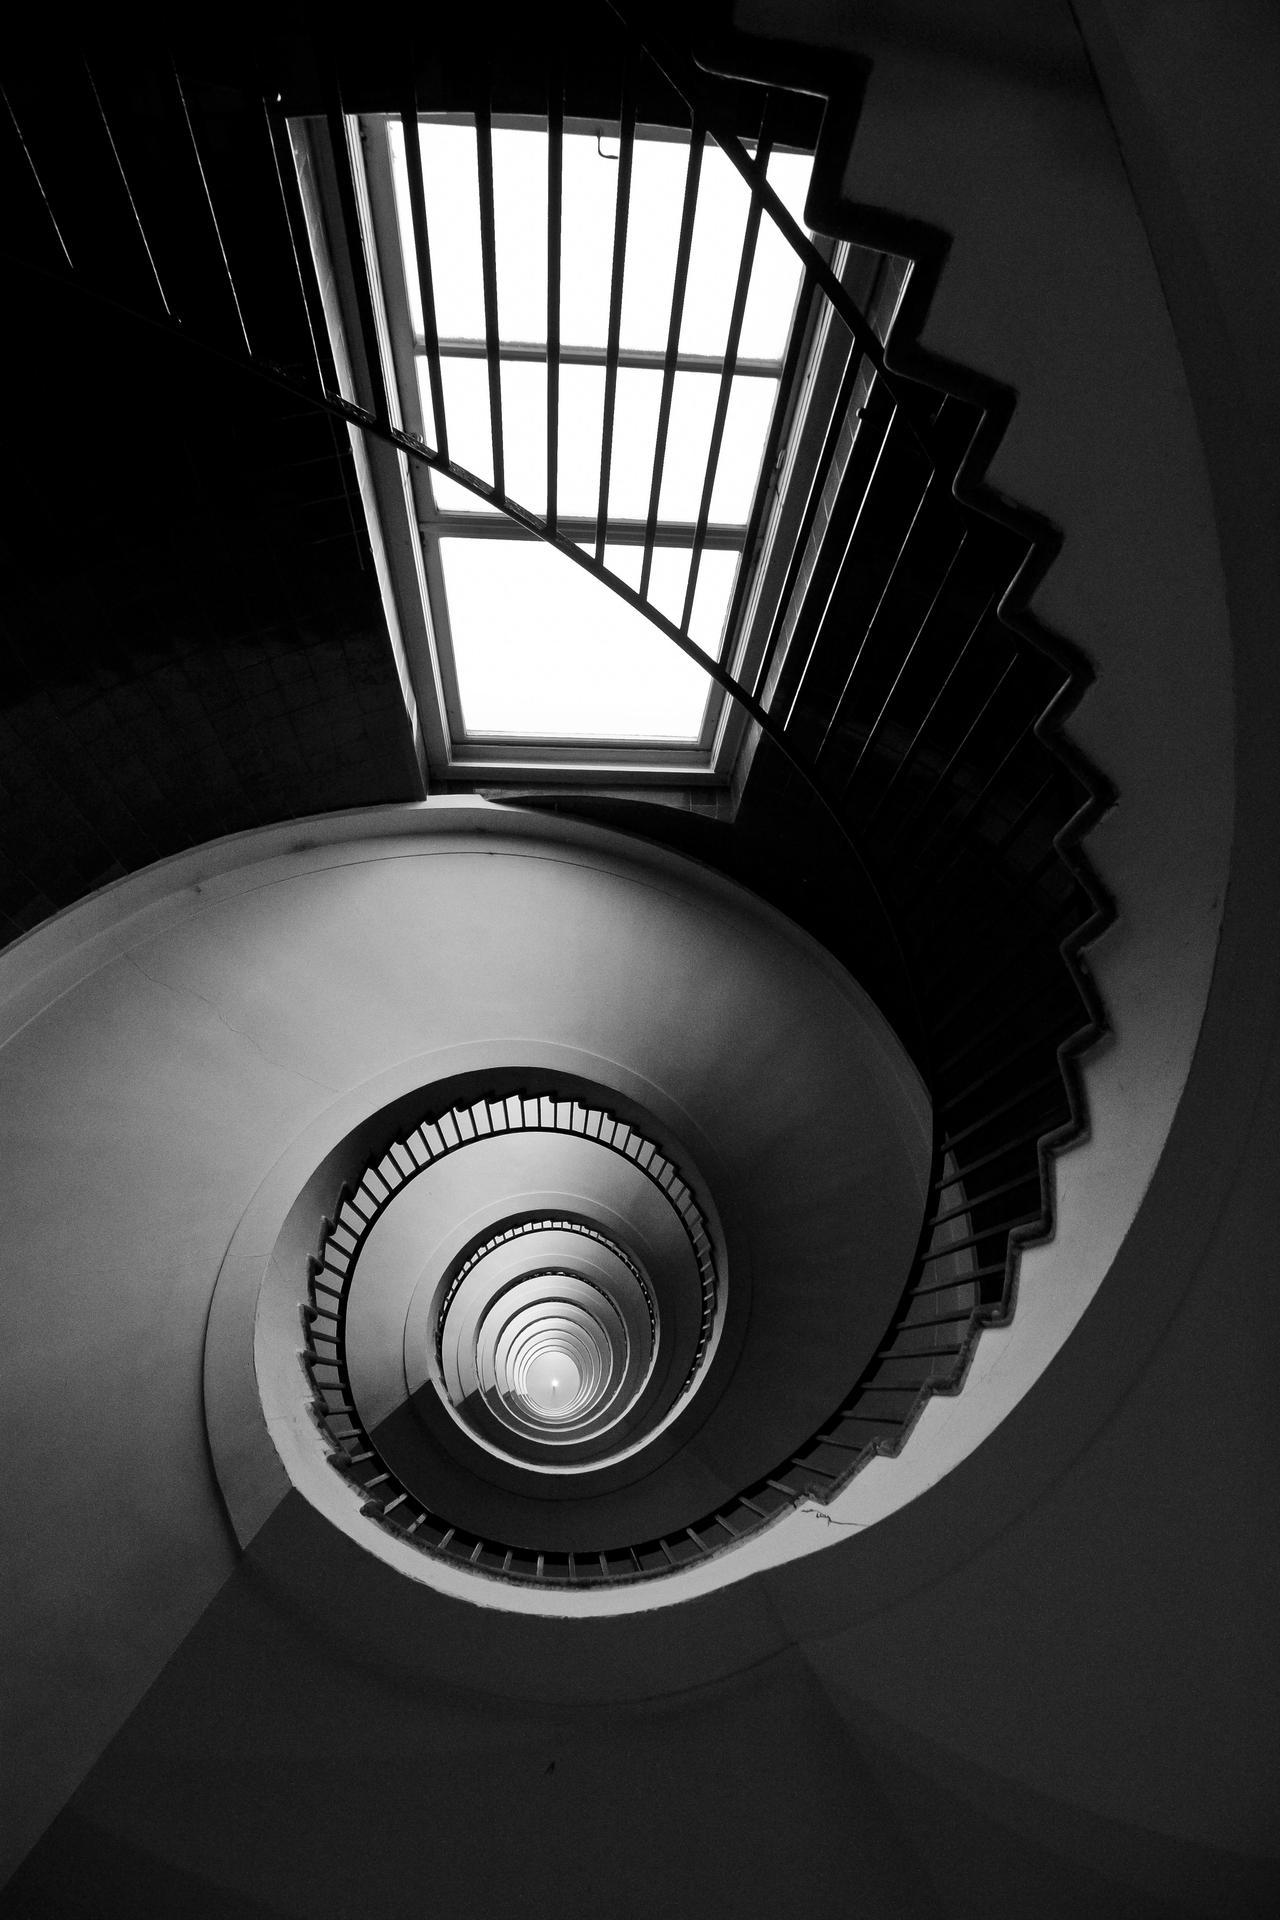 Neboticnik staircase by luka567